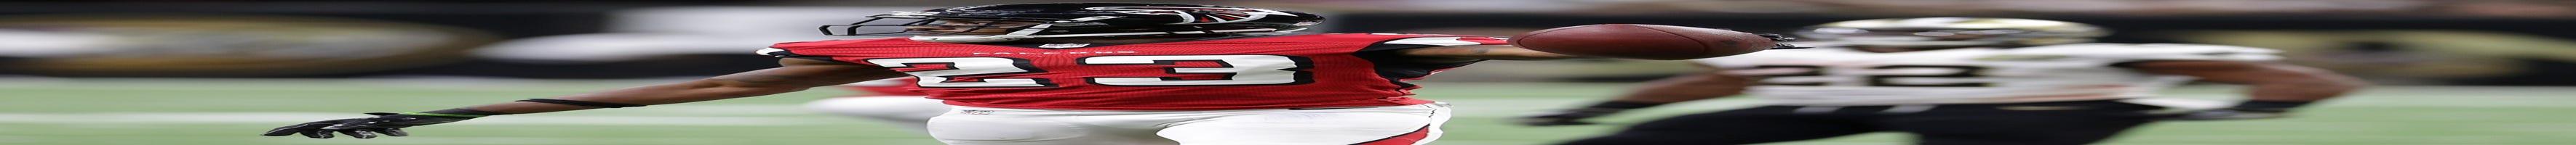 Monday's roundup: Freeman, Coleman lift Falcons